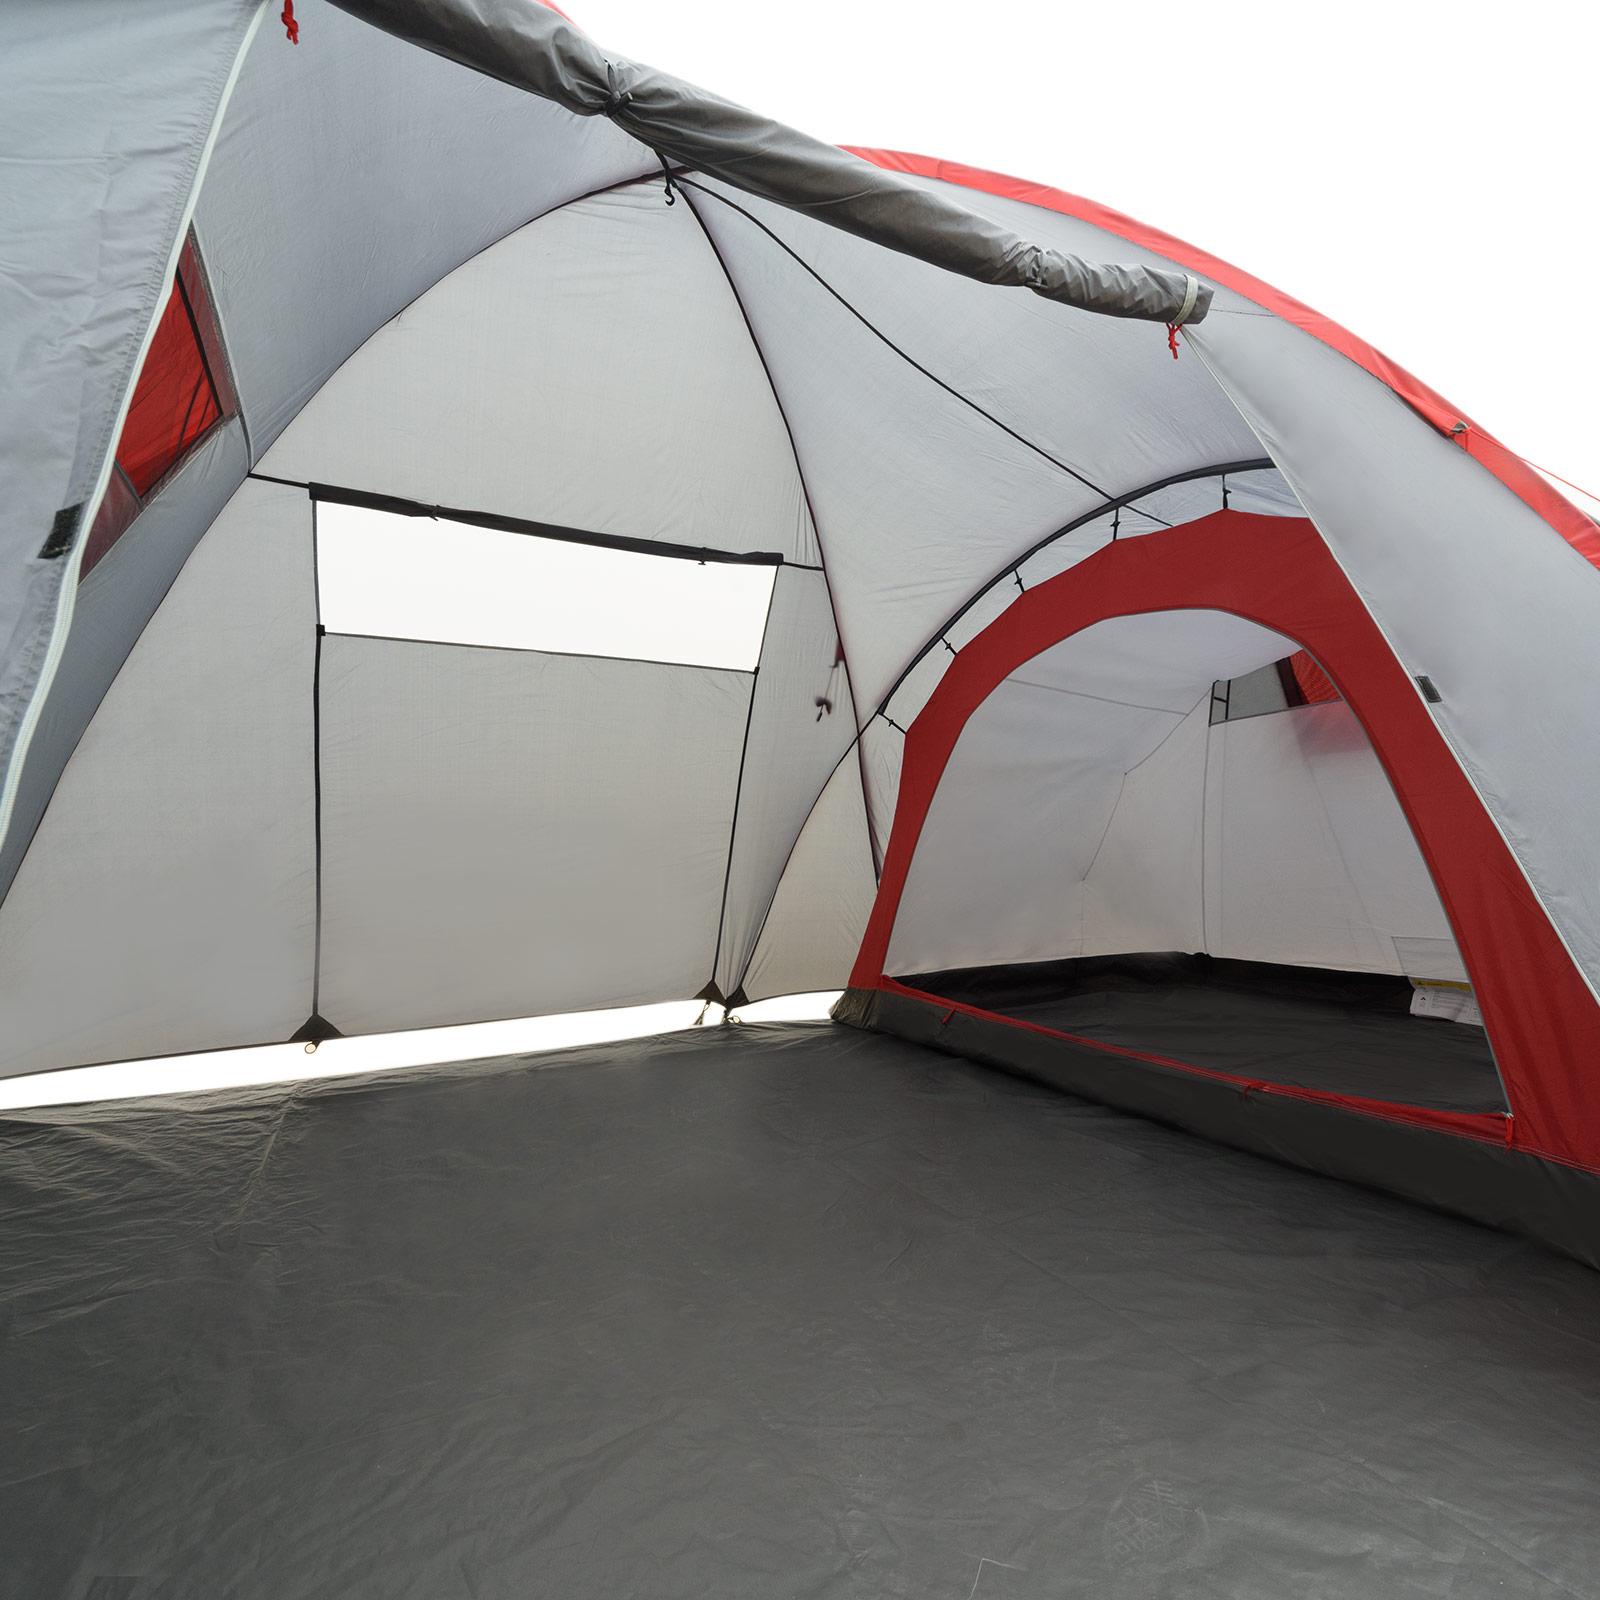 Zelt 4 Personen Stehhöhe : Zelt mit stehhöhe justcamp parker familienzelt